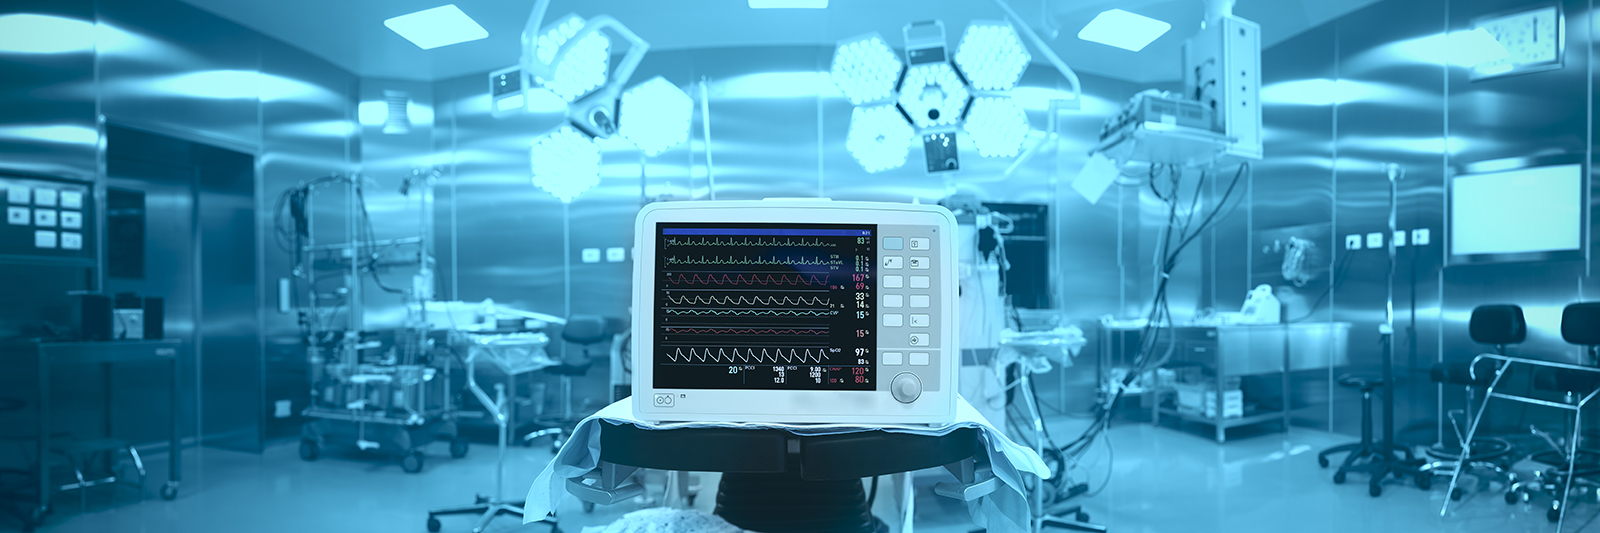 bigstock-Innovative-Technology-In-A-Mod-90865265.1